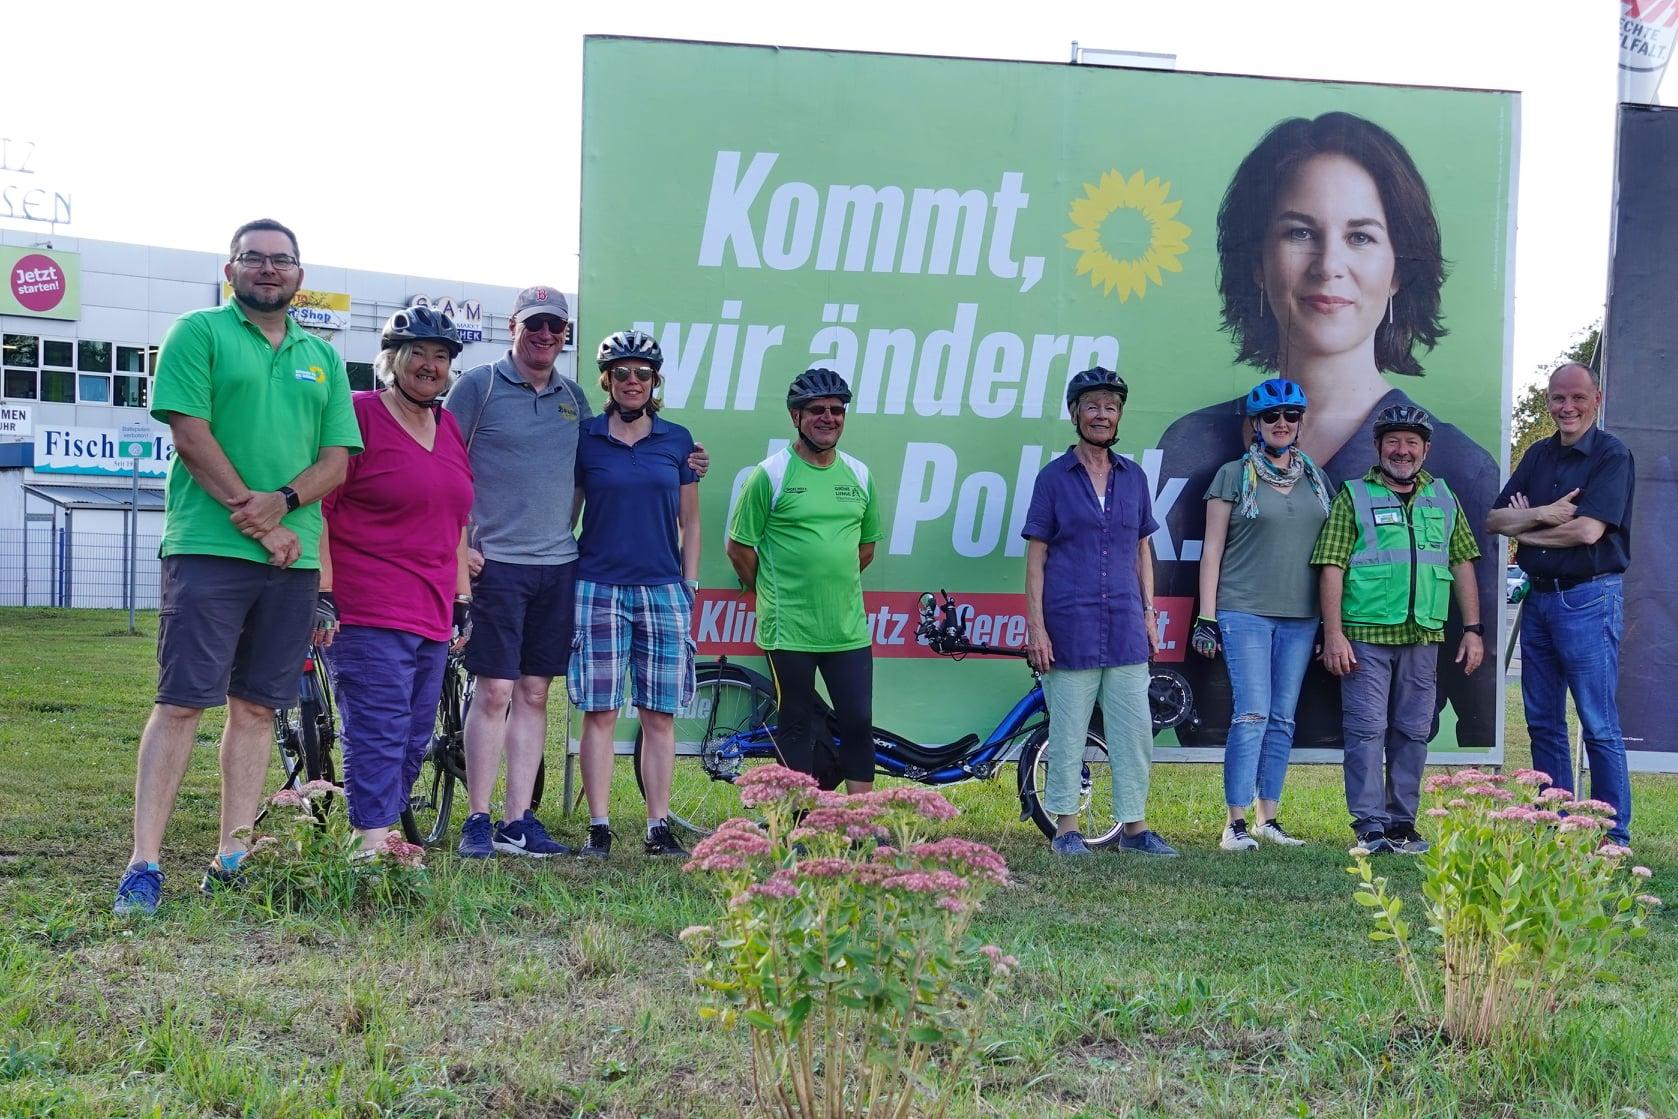 Politische Radtour Obertshausen